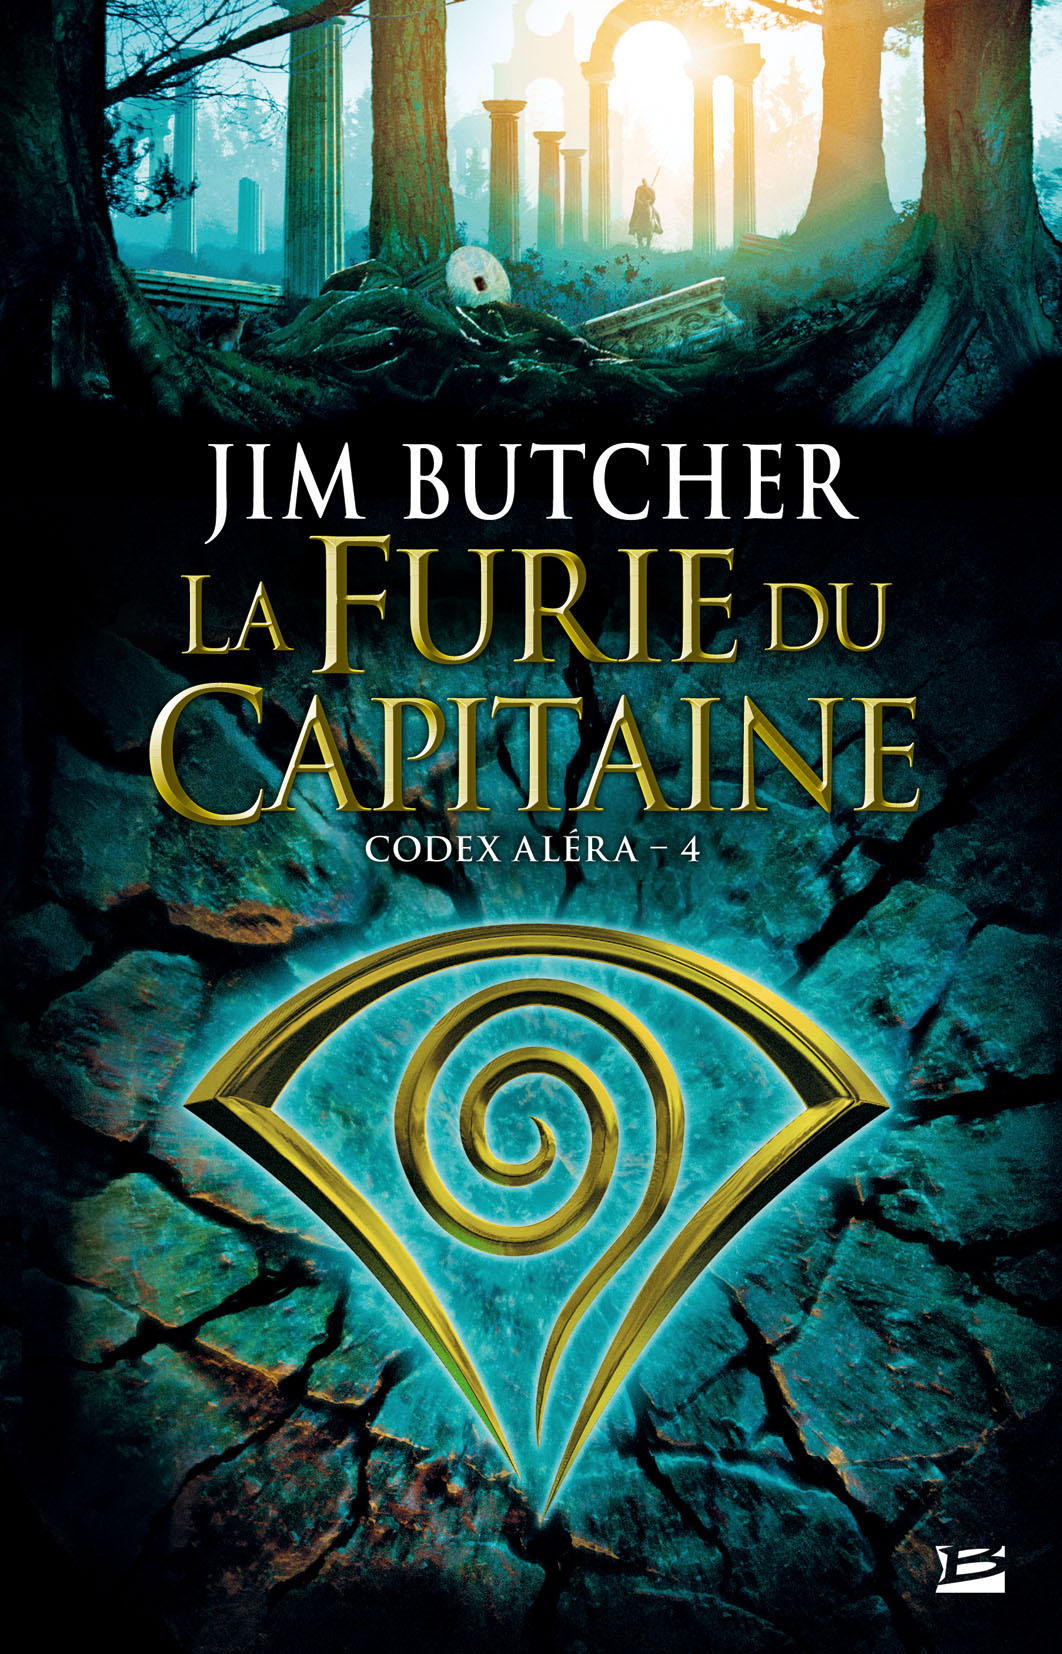 http://ressources.bragelonne.fr/img/livres/2012-01/9782352945468_org.jpg